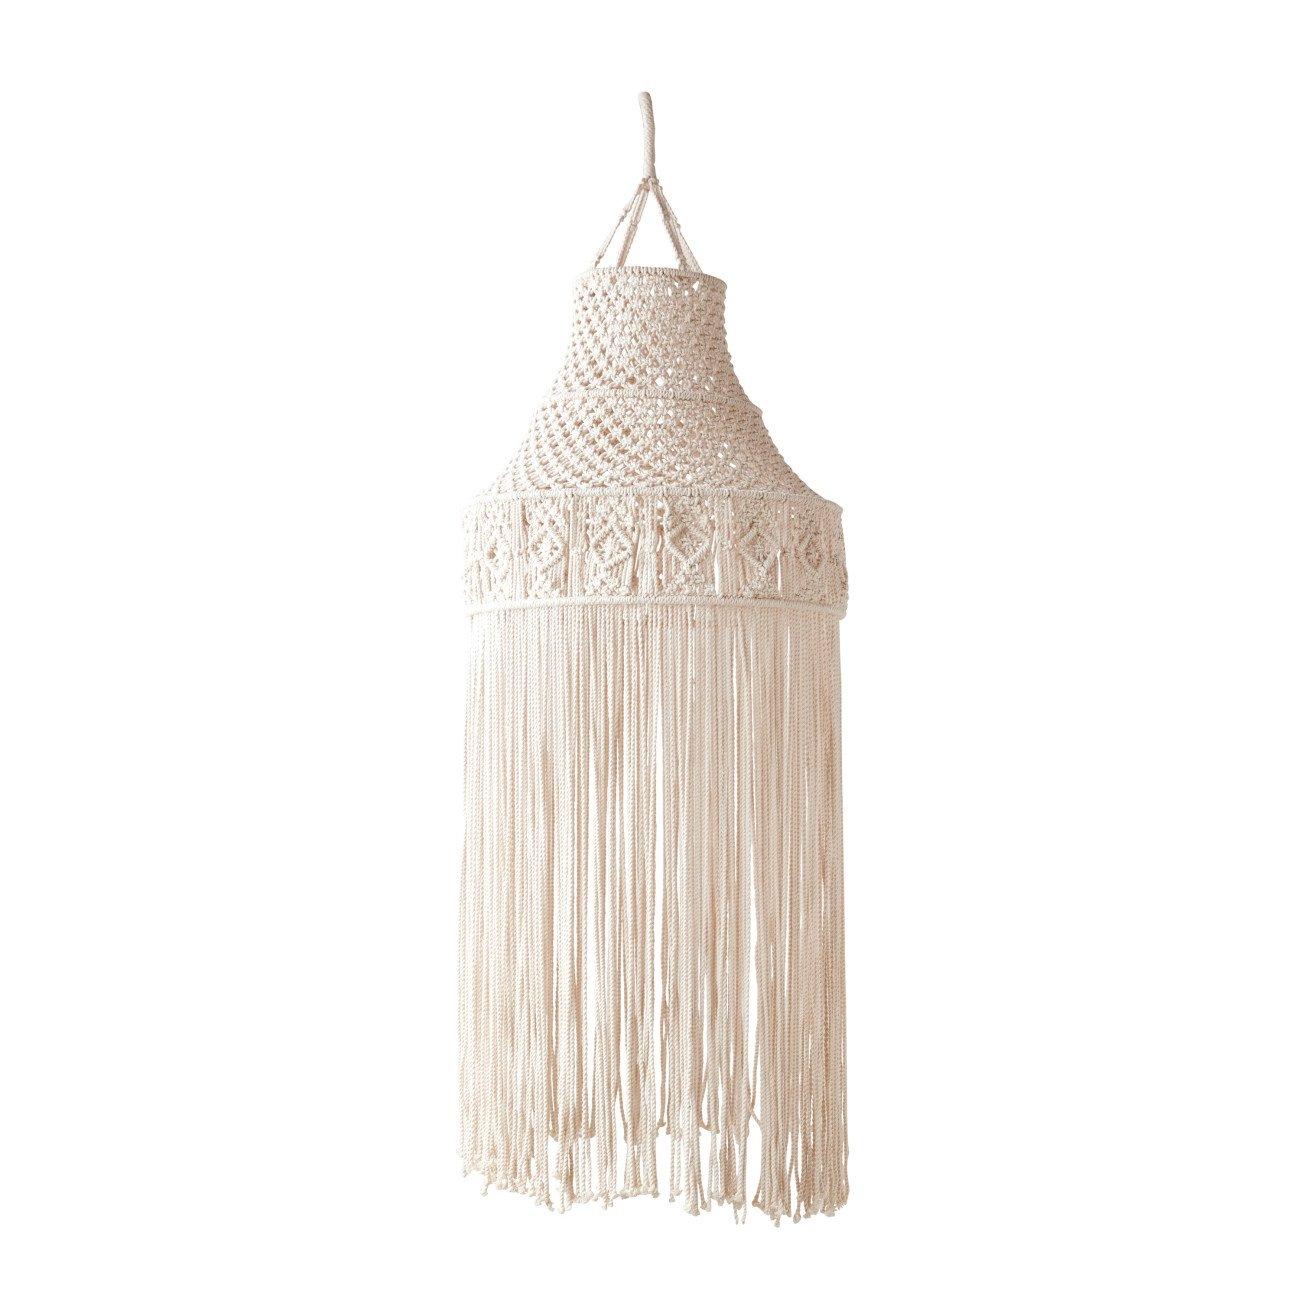 Cream Macramé Hanging Canopy